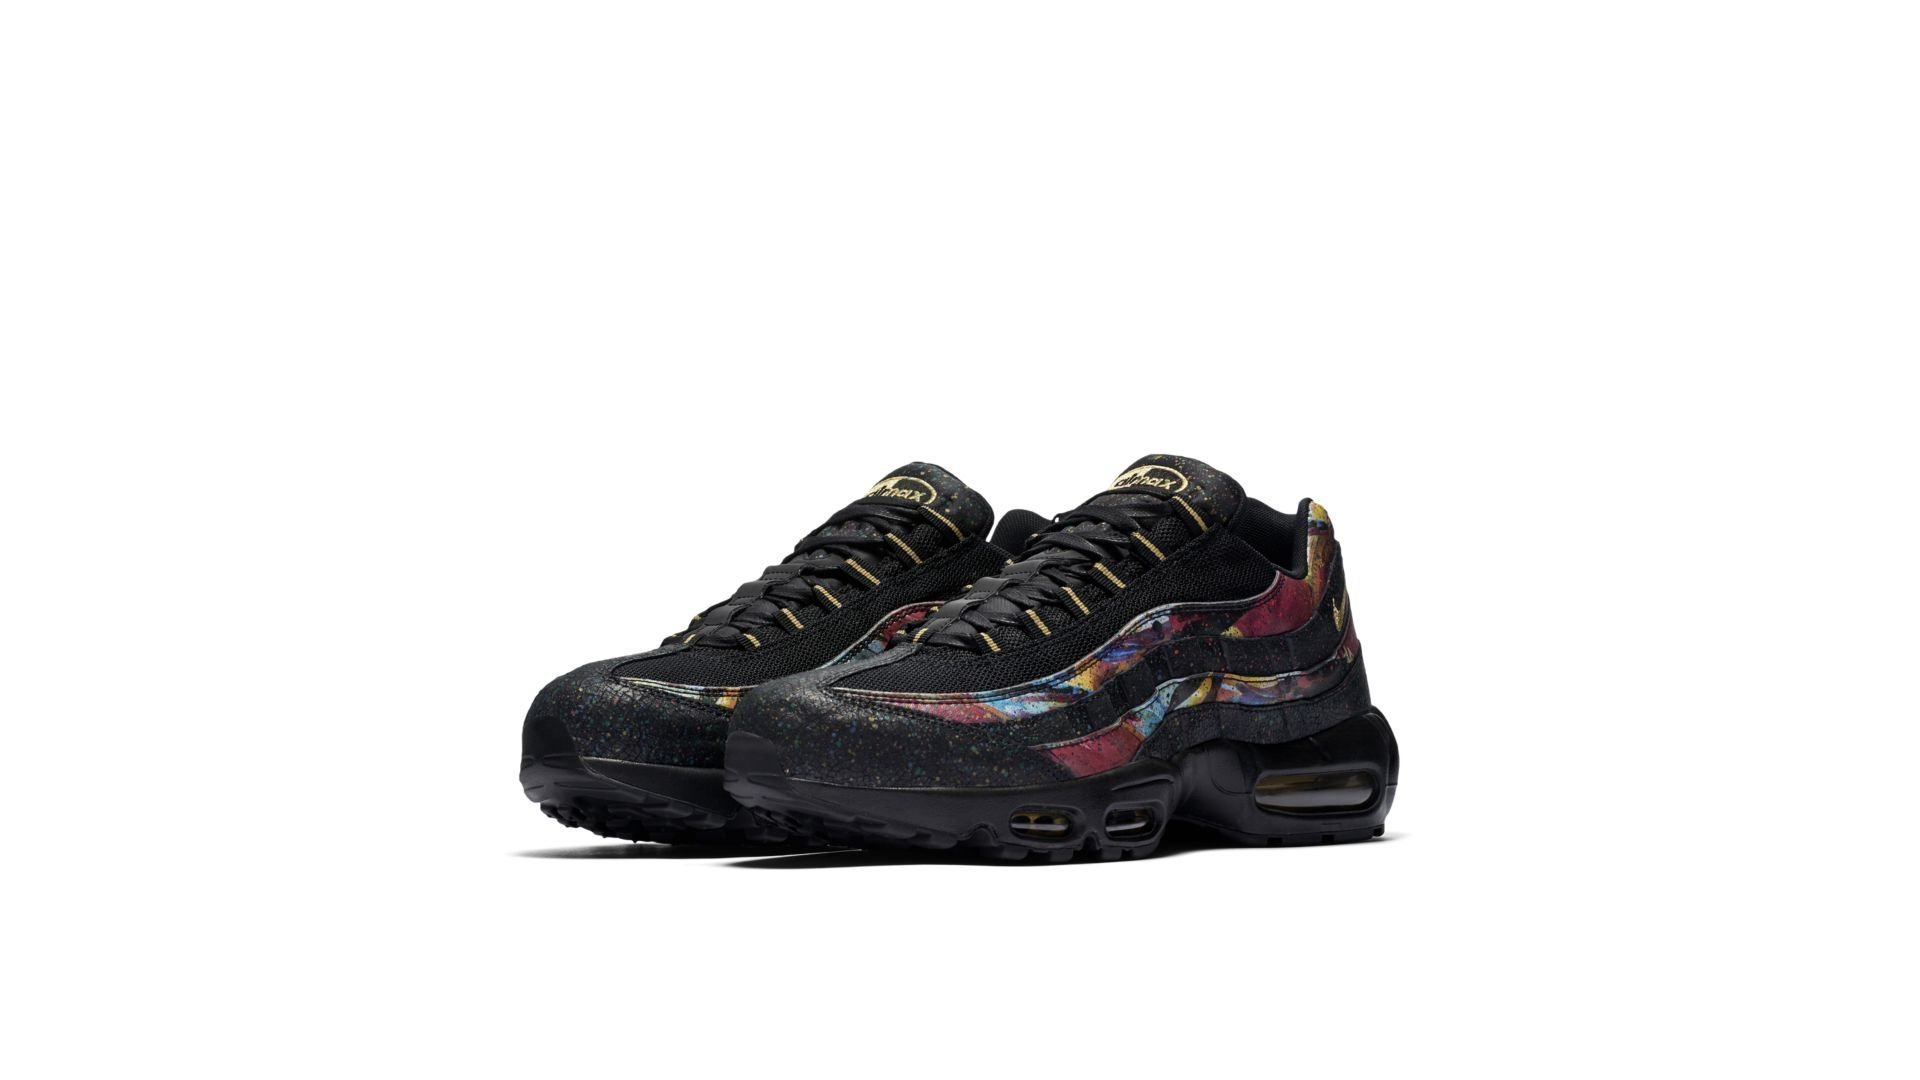 Nike Air Max 95 Black Gold Cobalt Blaze AT6142 001